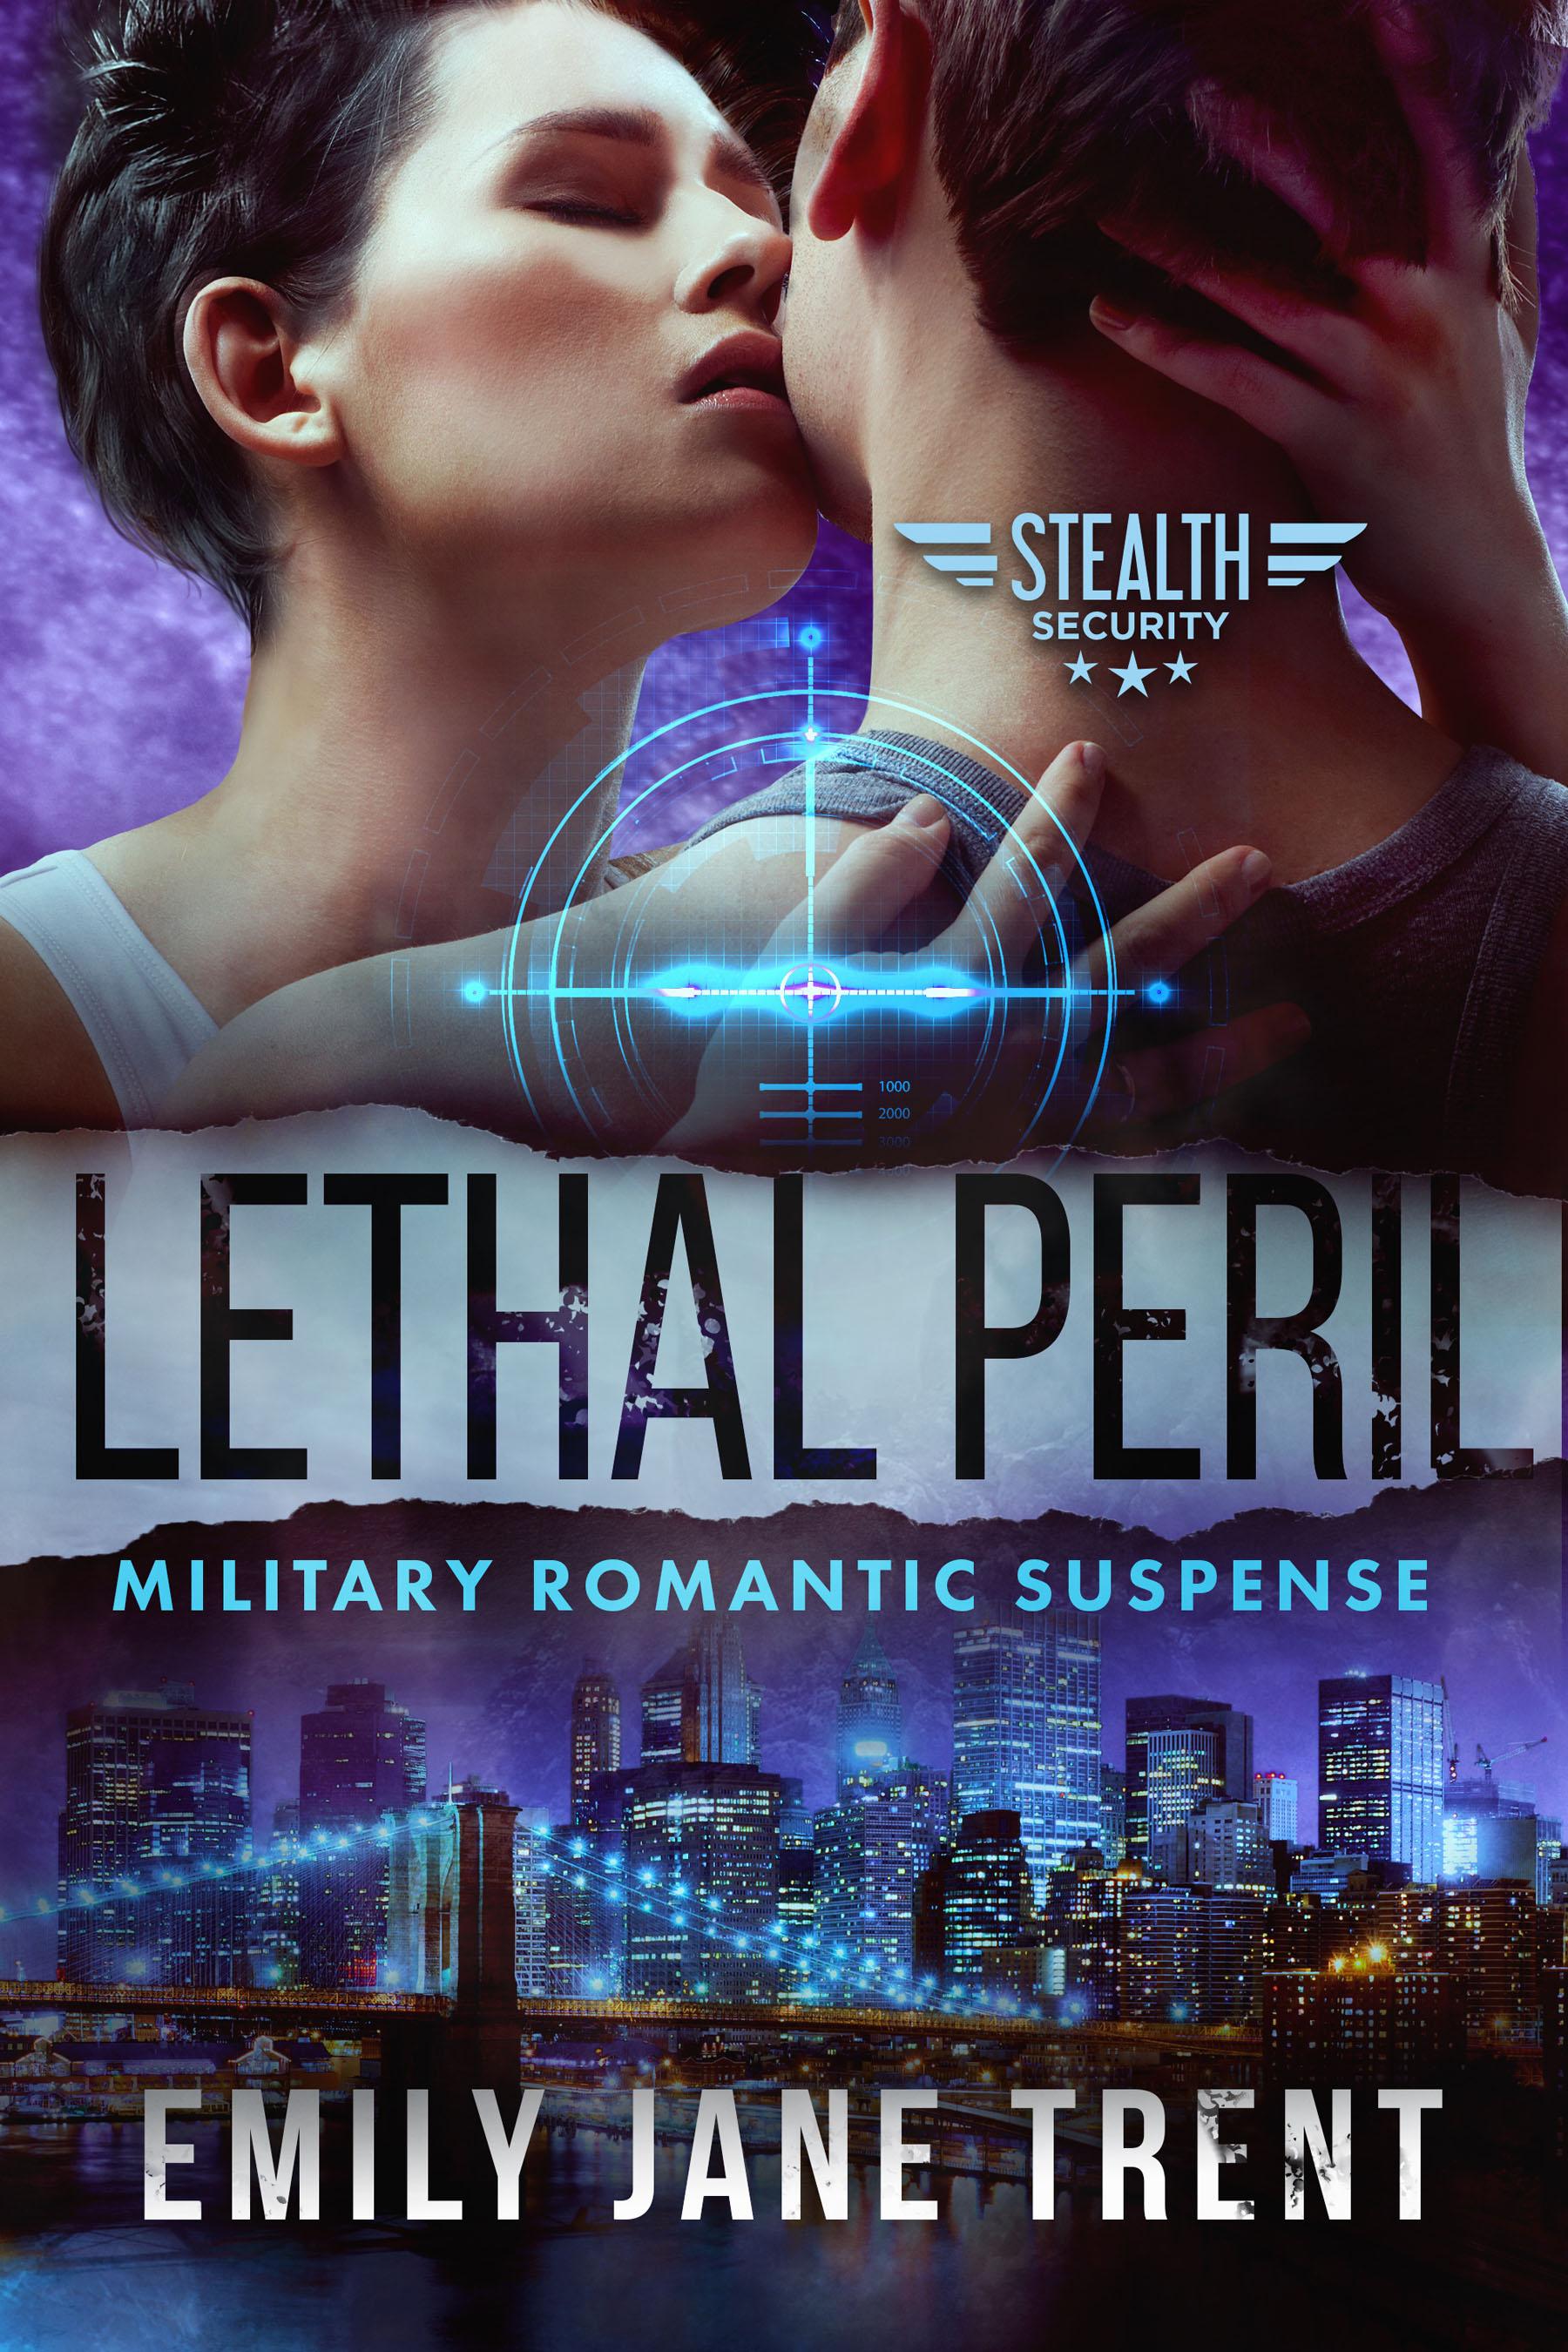 Lethal Peril